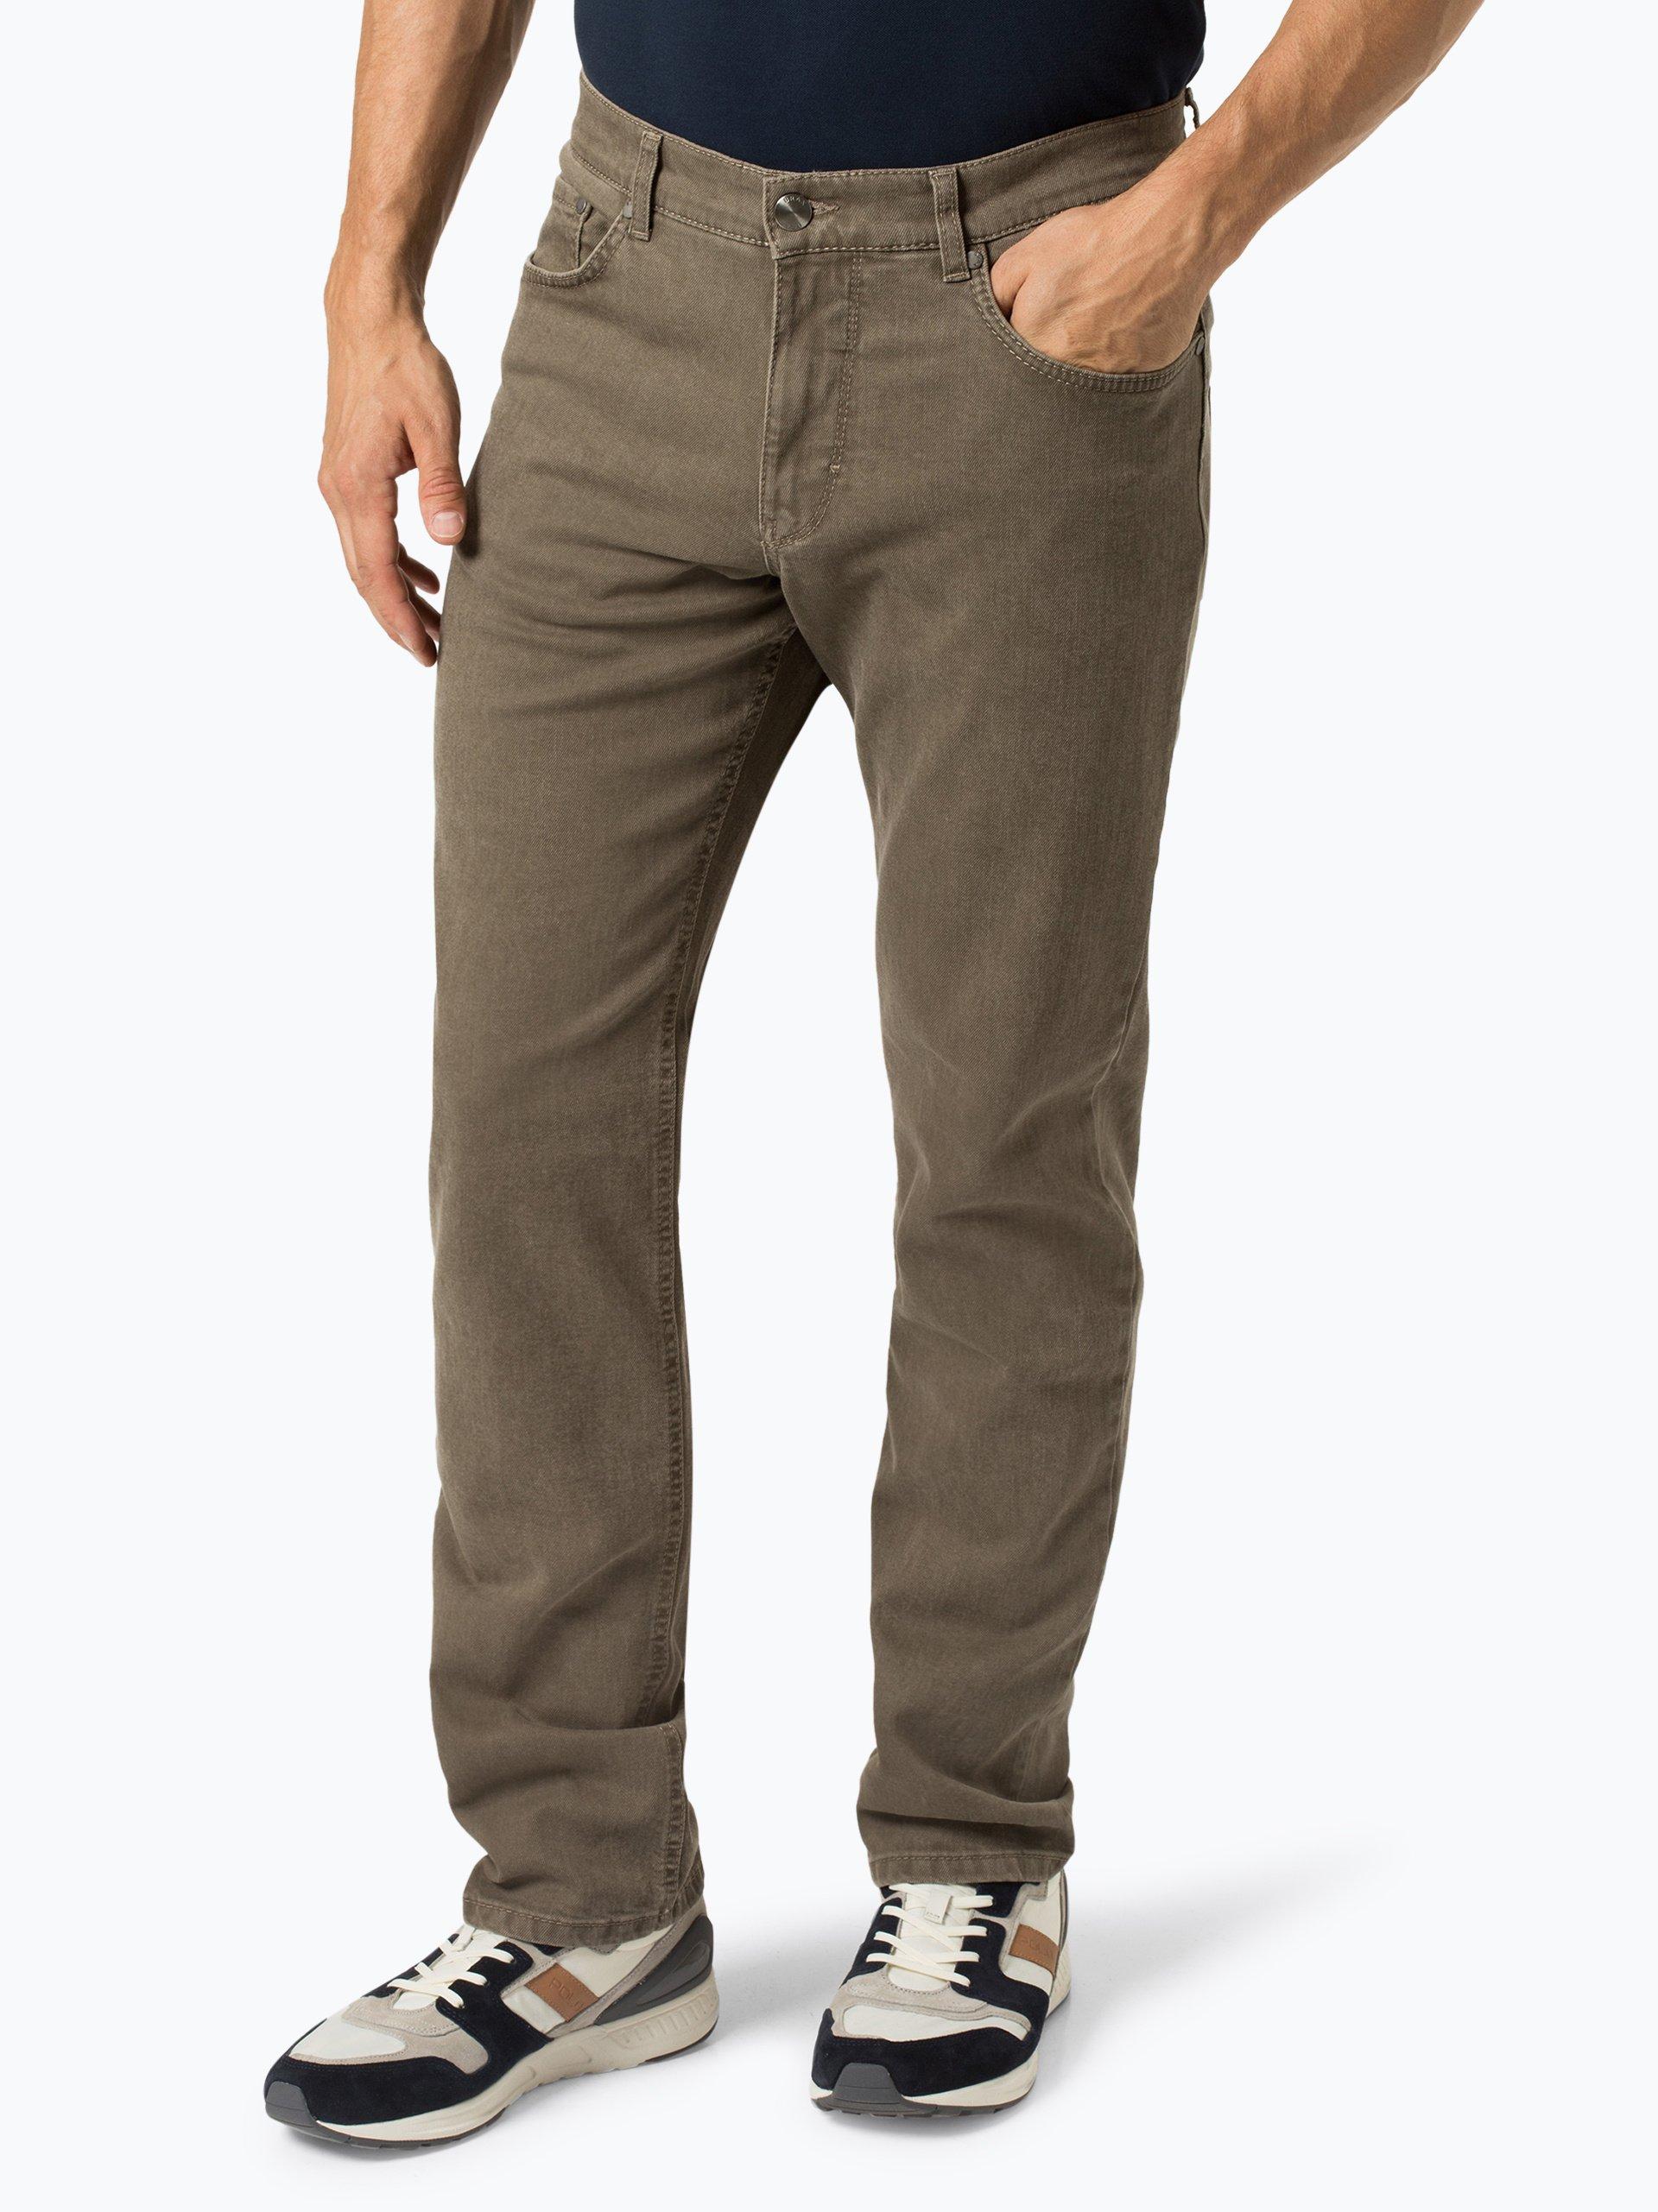 brax herren jeans cooper khaki uni online kaufen. Black Bedroom Furniture Sets. Home Design Ideas